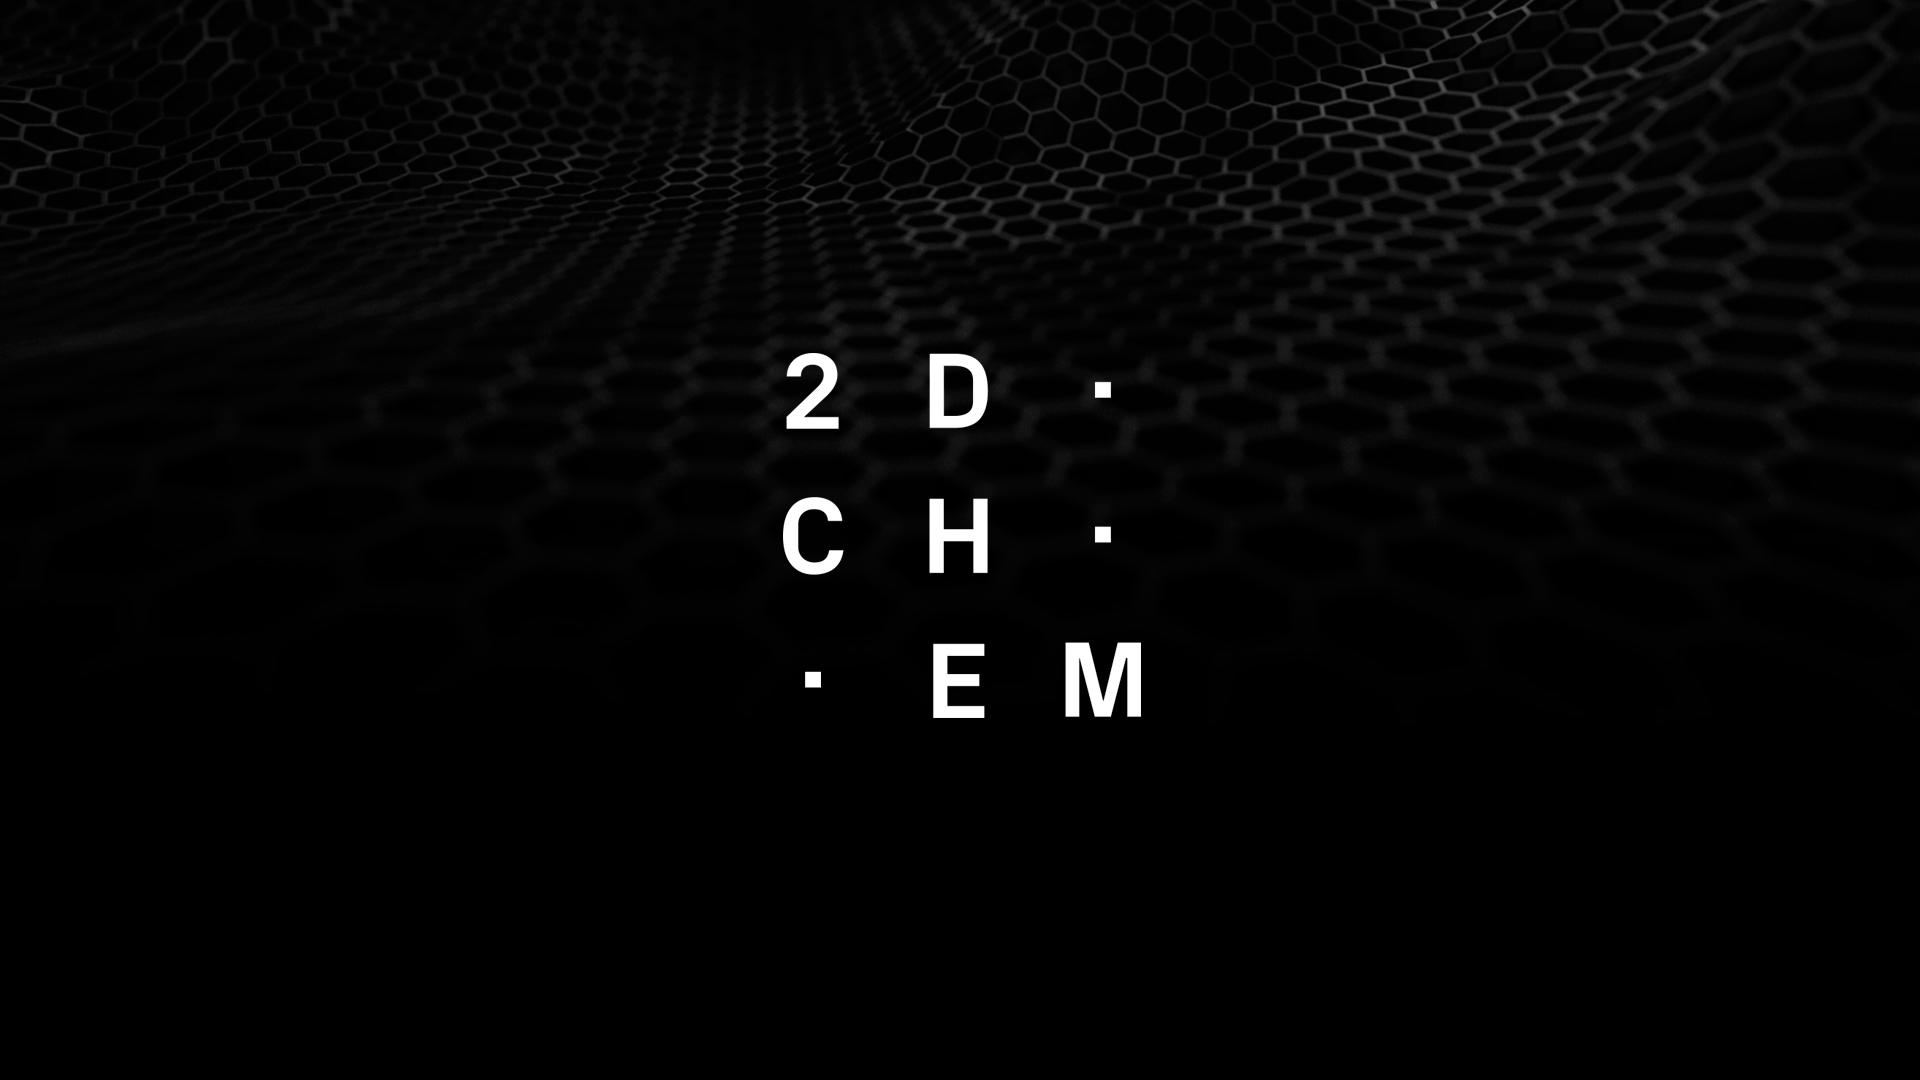 2D Chem